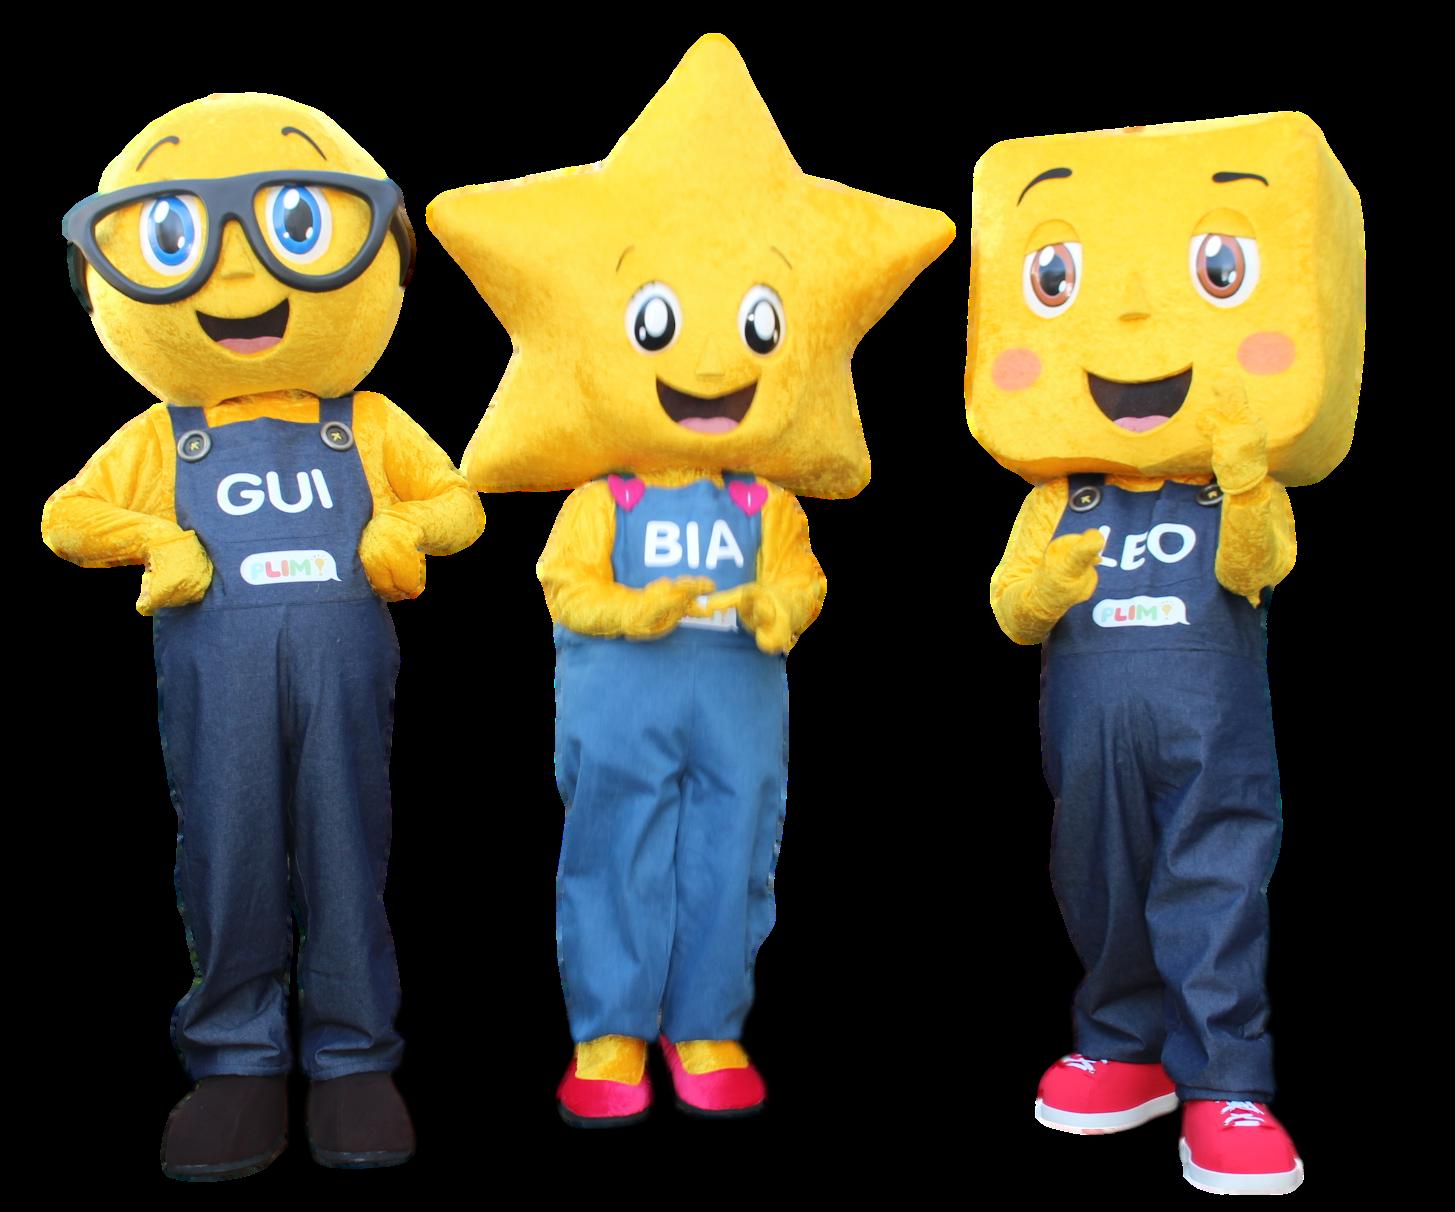 Mascote Partyval Formas Bia, Leo e Gui